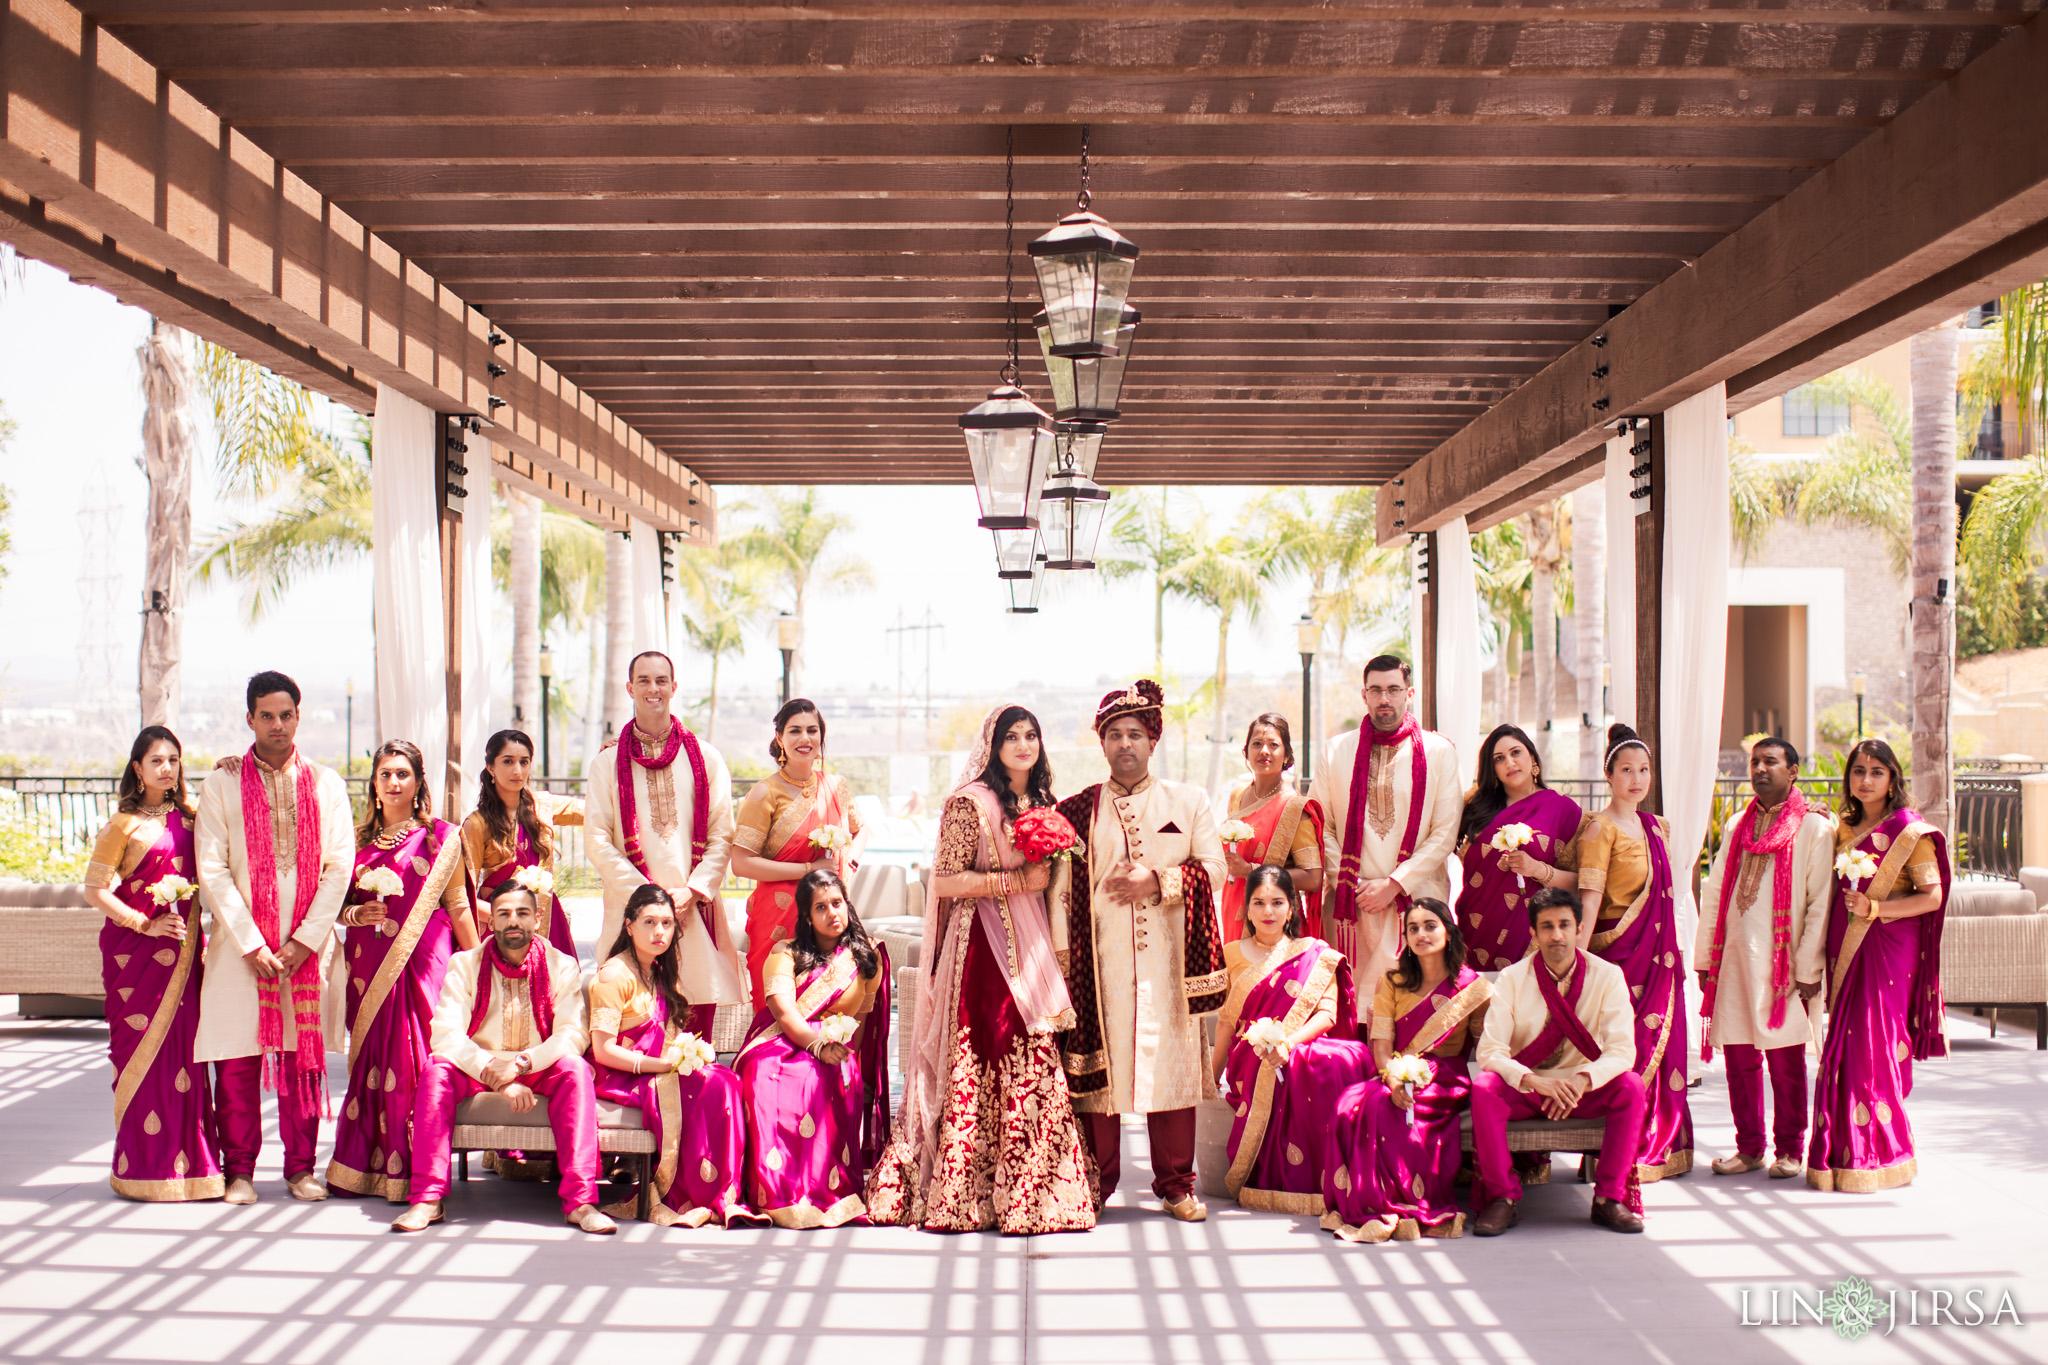 17 sheraton carlsbad resort indian wedding photography